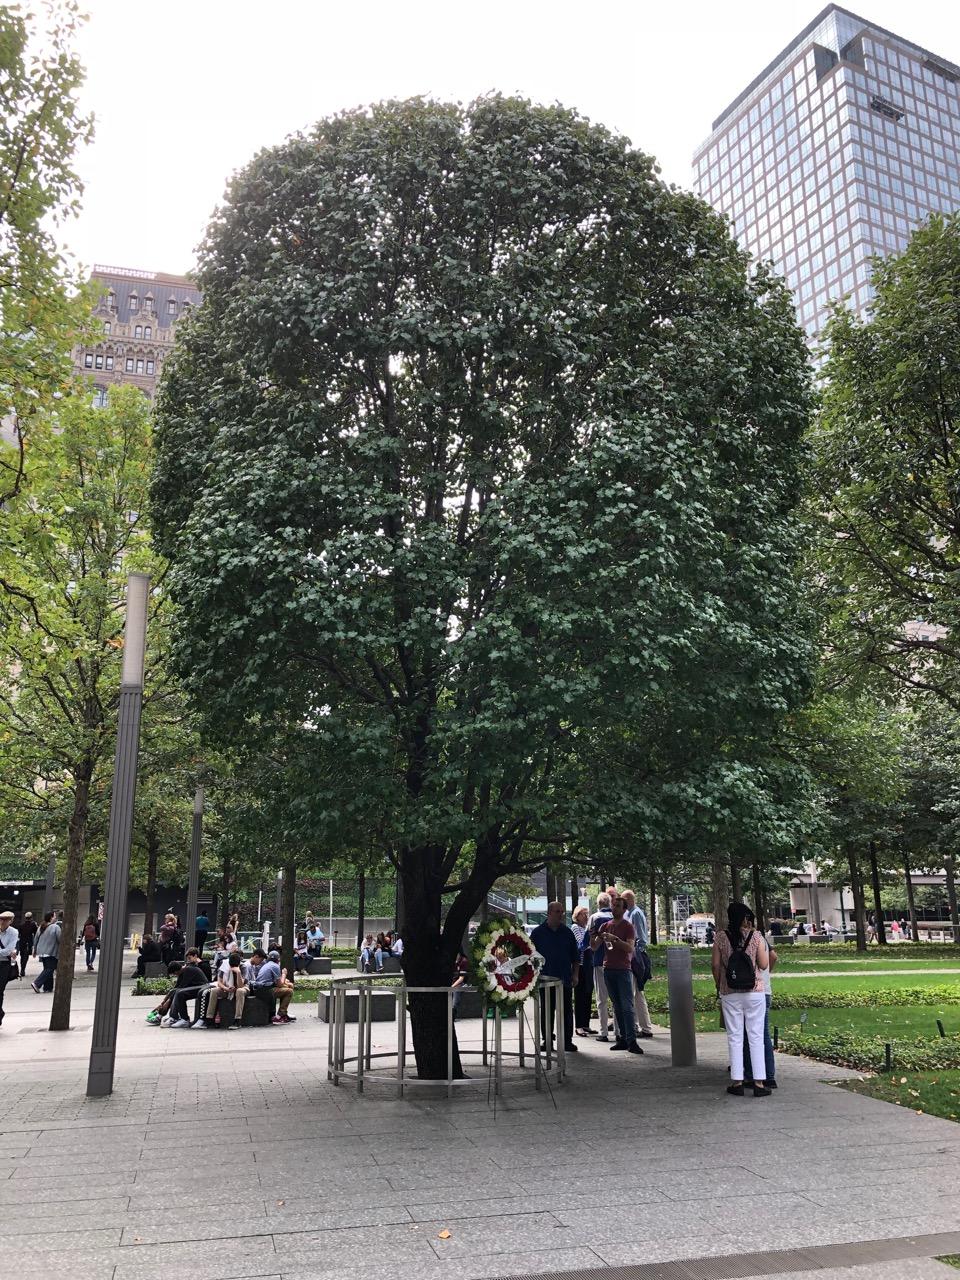 The Survivor Tree - See next image for description.